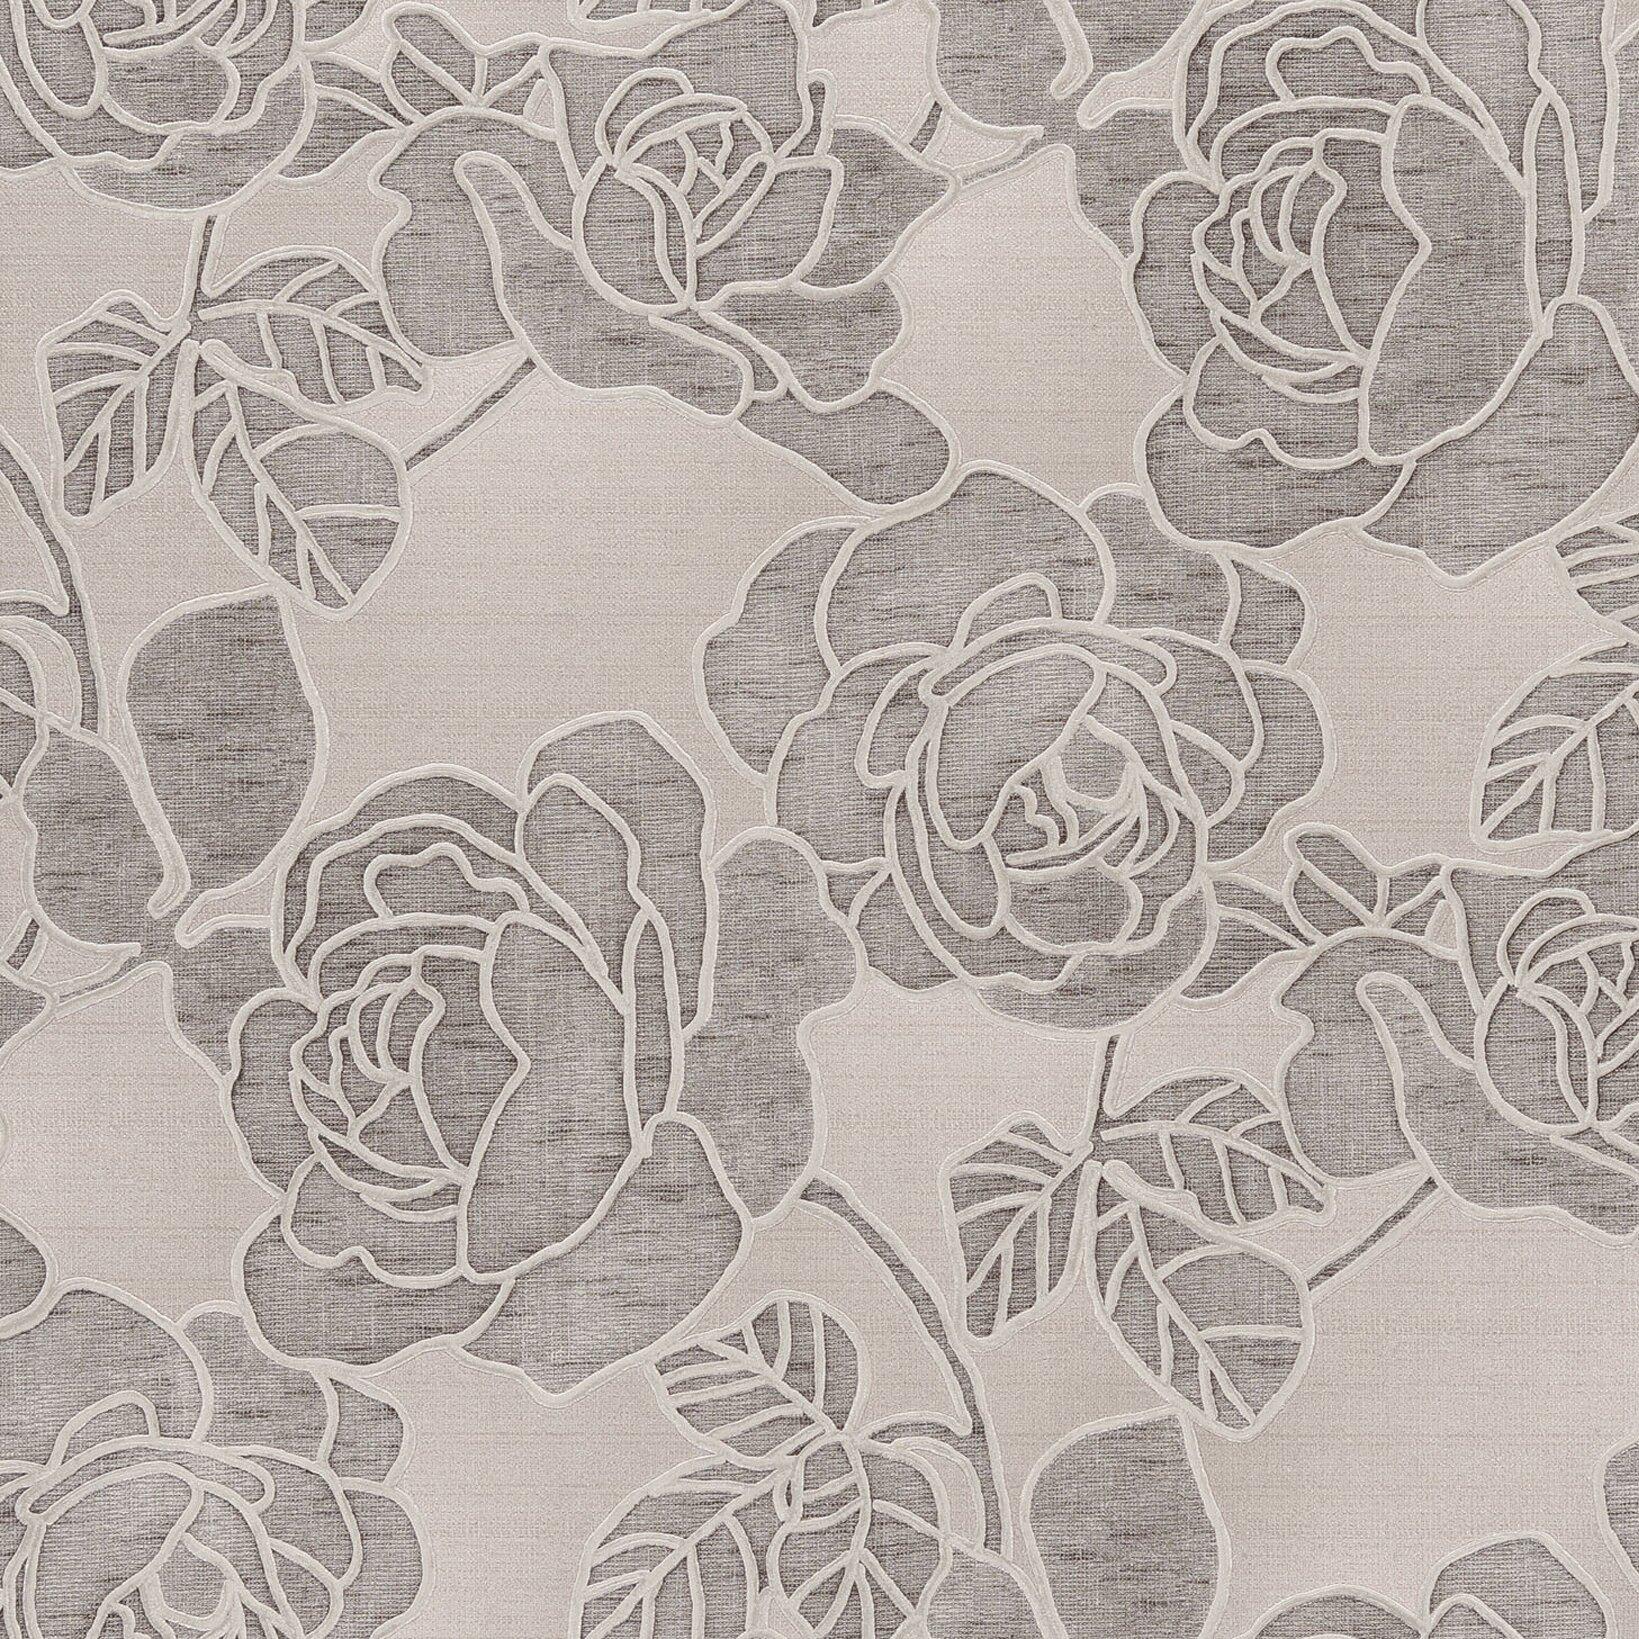 Brewster home fashions venezia sancia rosette weave 33 39 x for 3d embossed wallpaper